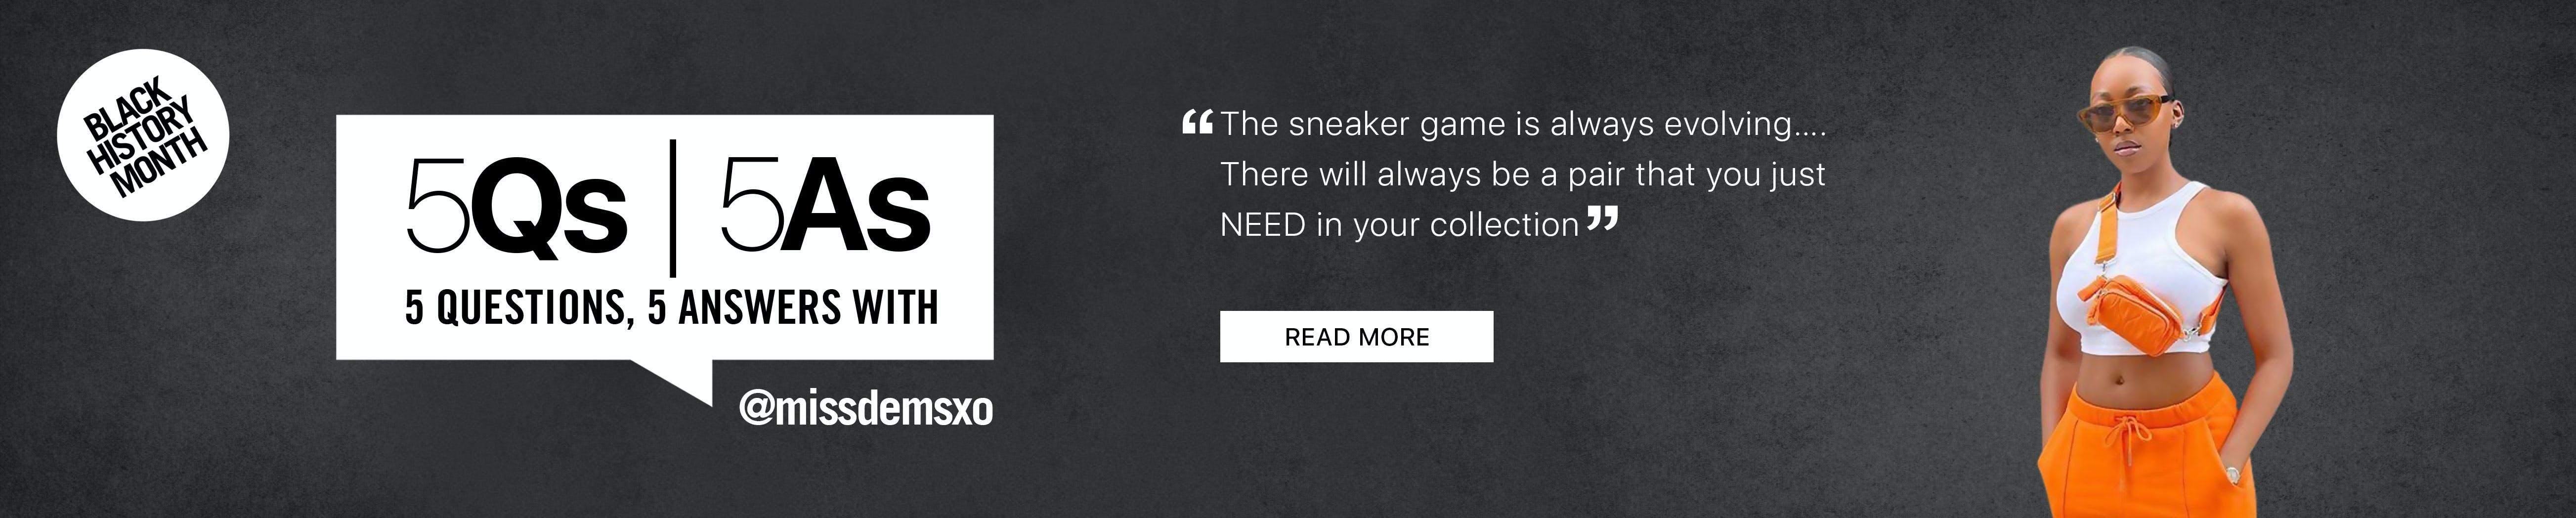 KLEKT Black History Month Sneakers Hype